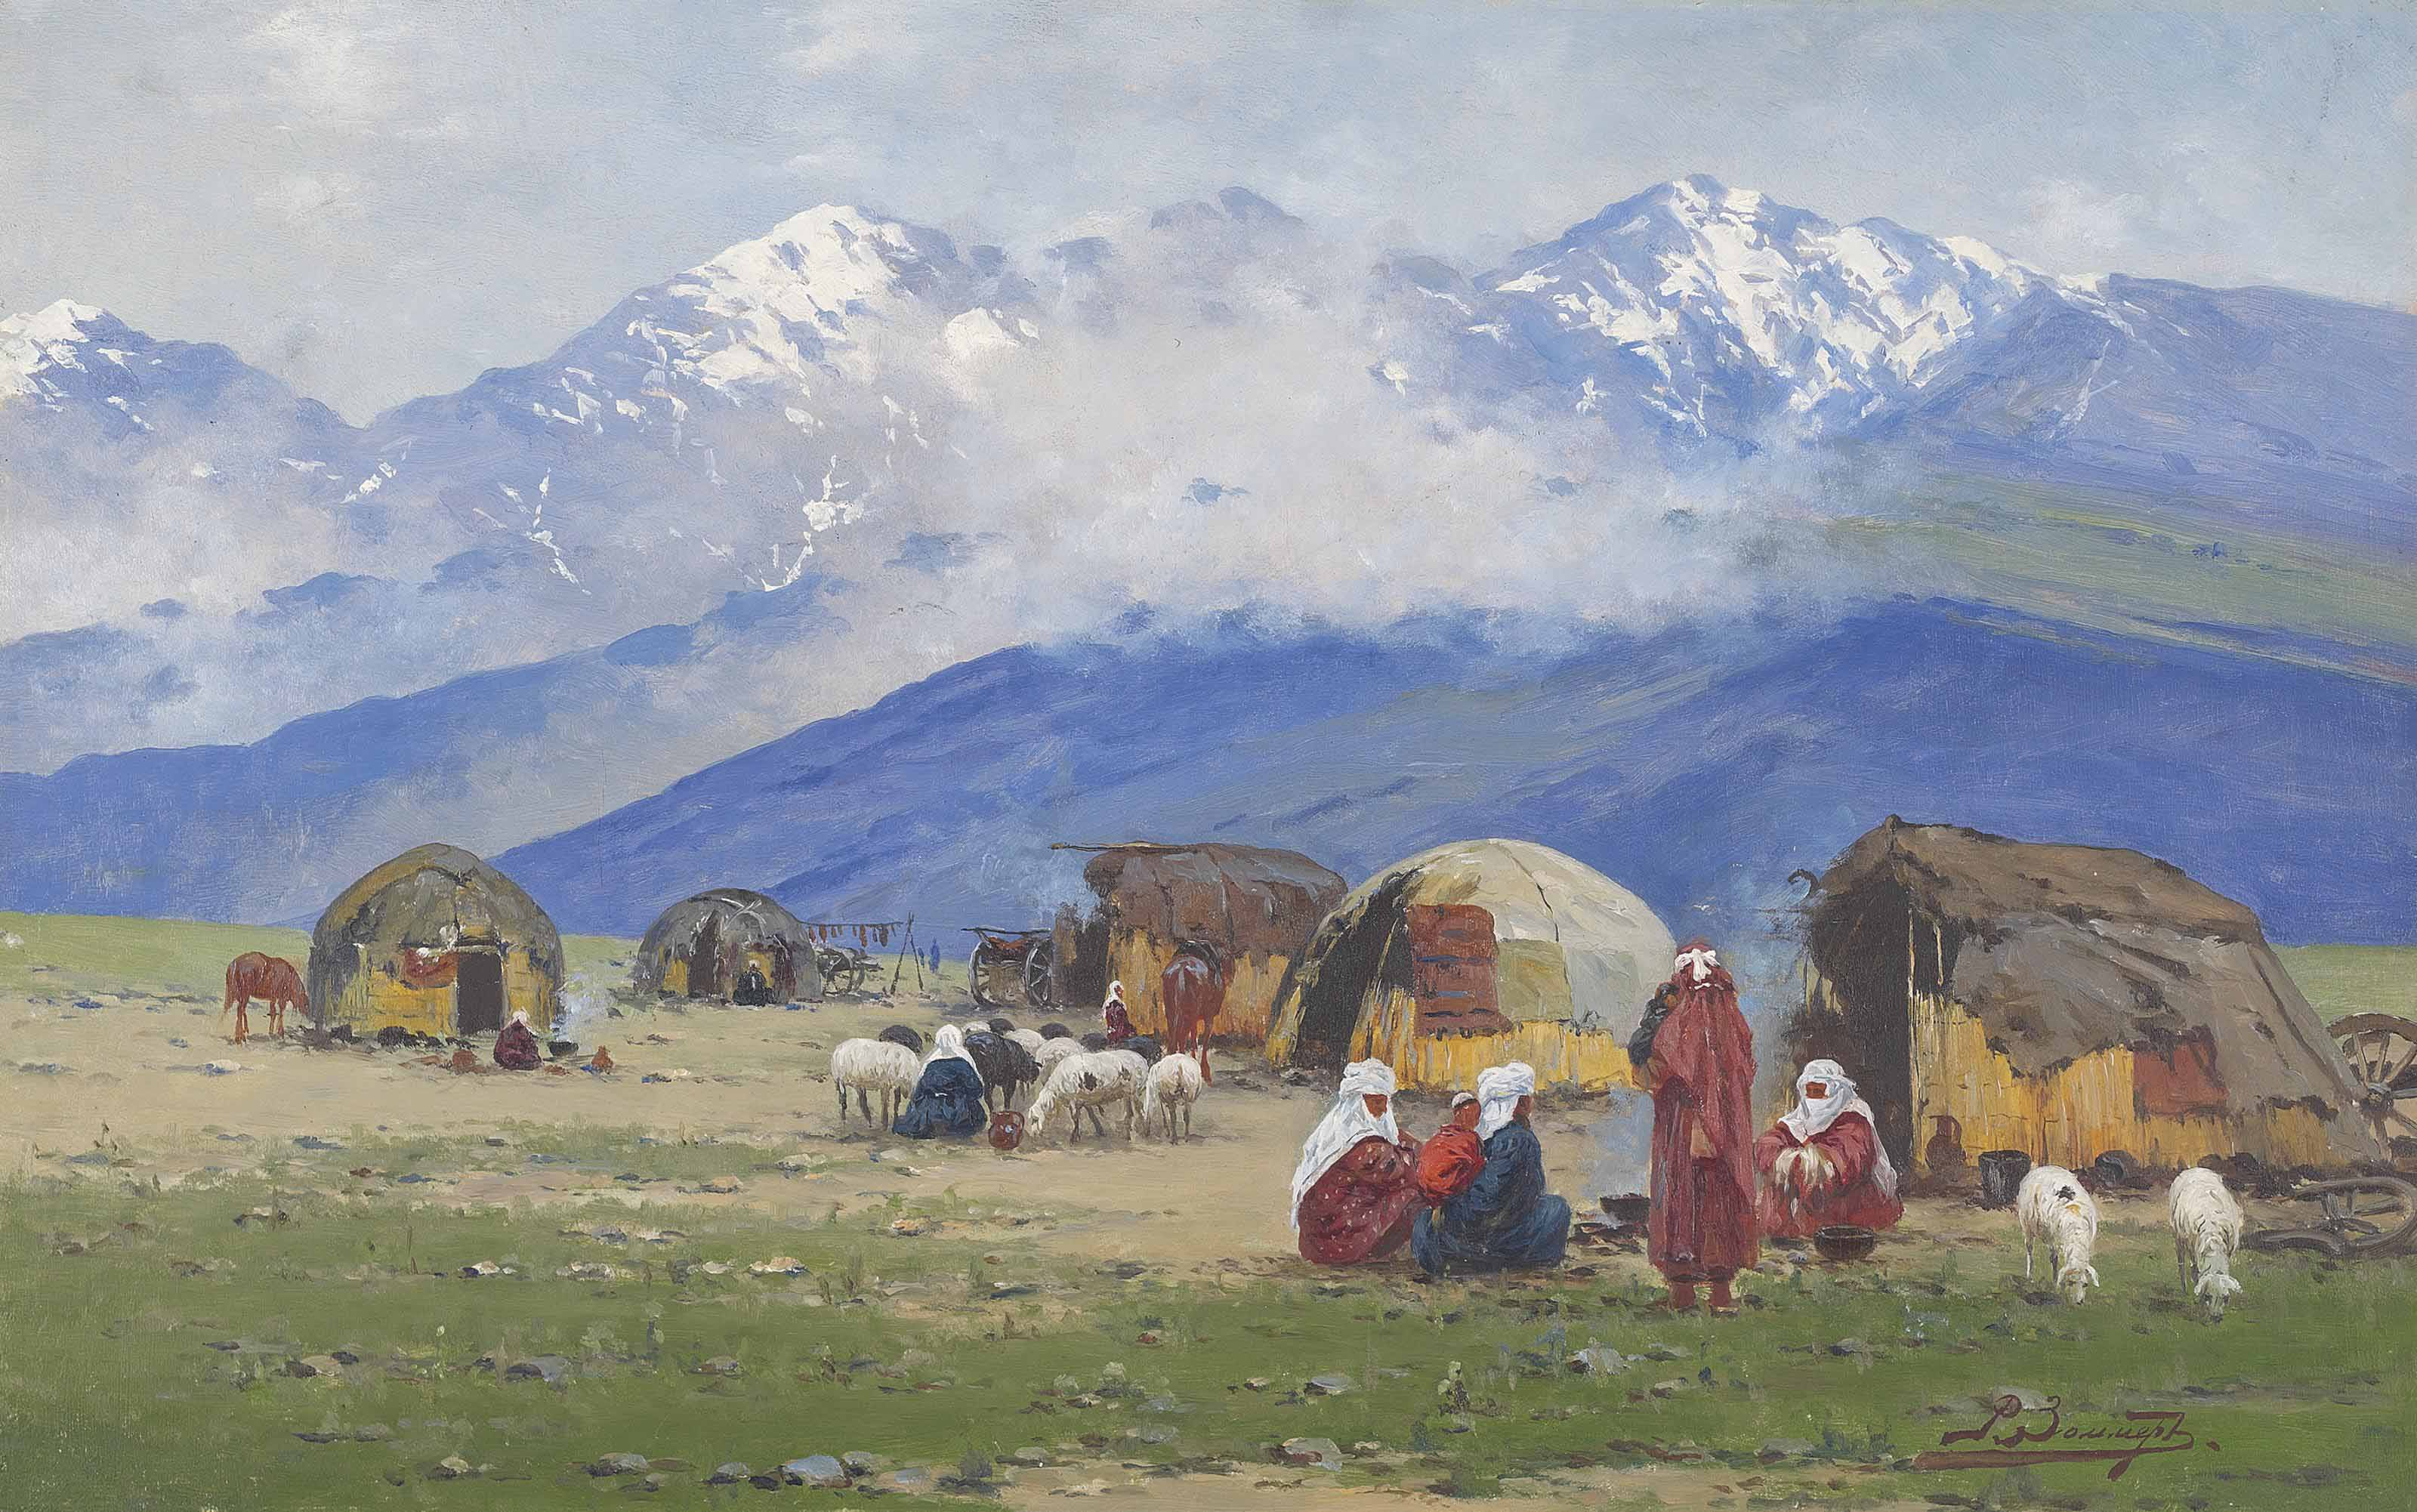 Kyrgyz, Turkestan